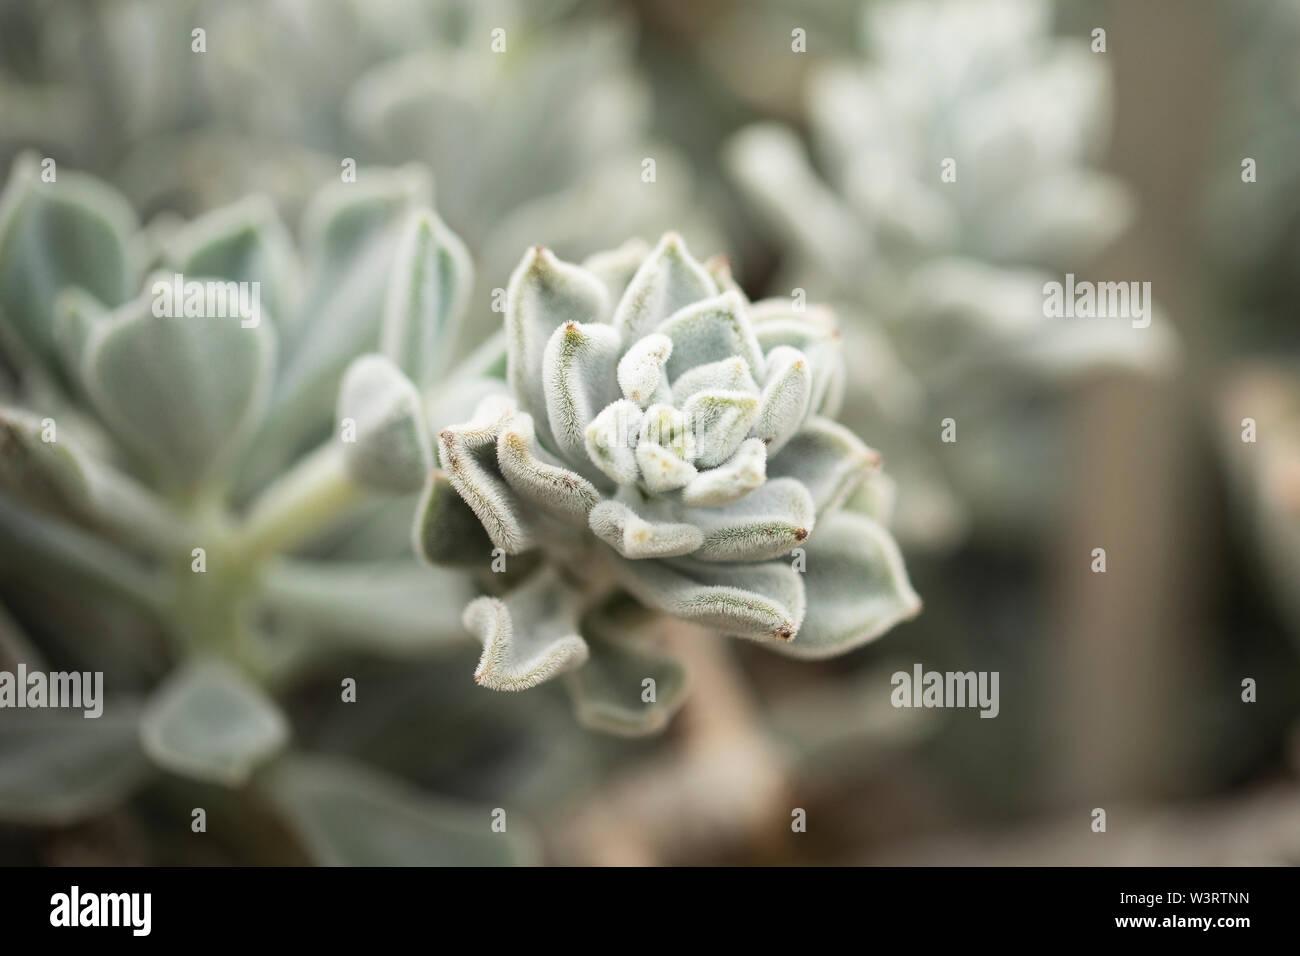 Echeveria Pulvinata Or Plush Plant A Succulent Native To Semi Arid Areas Of Mexico Central America And South America Stock Photo Alamy